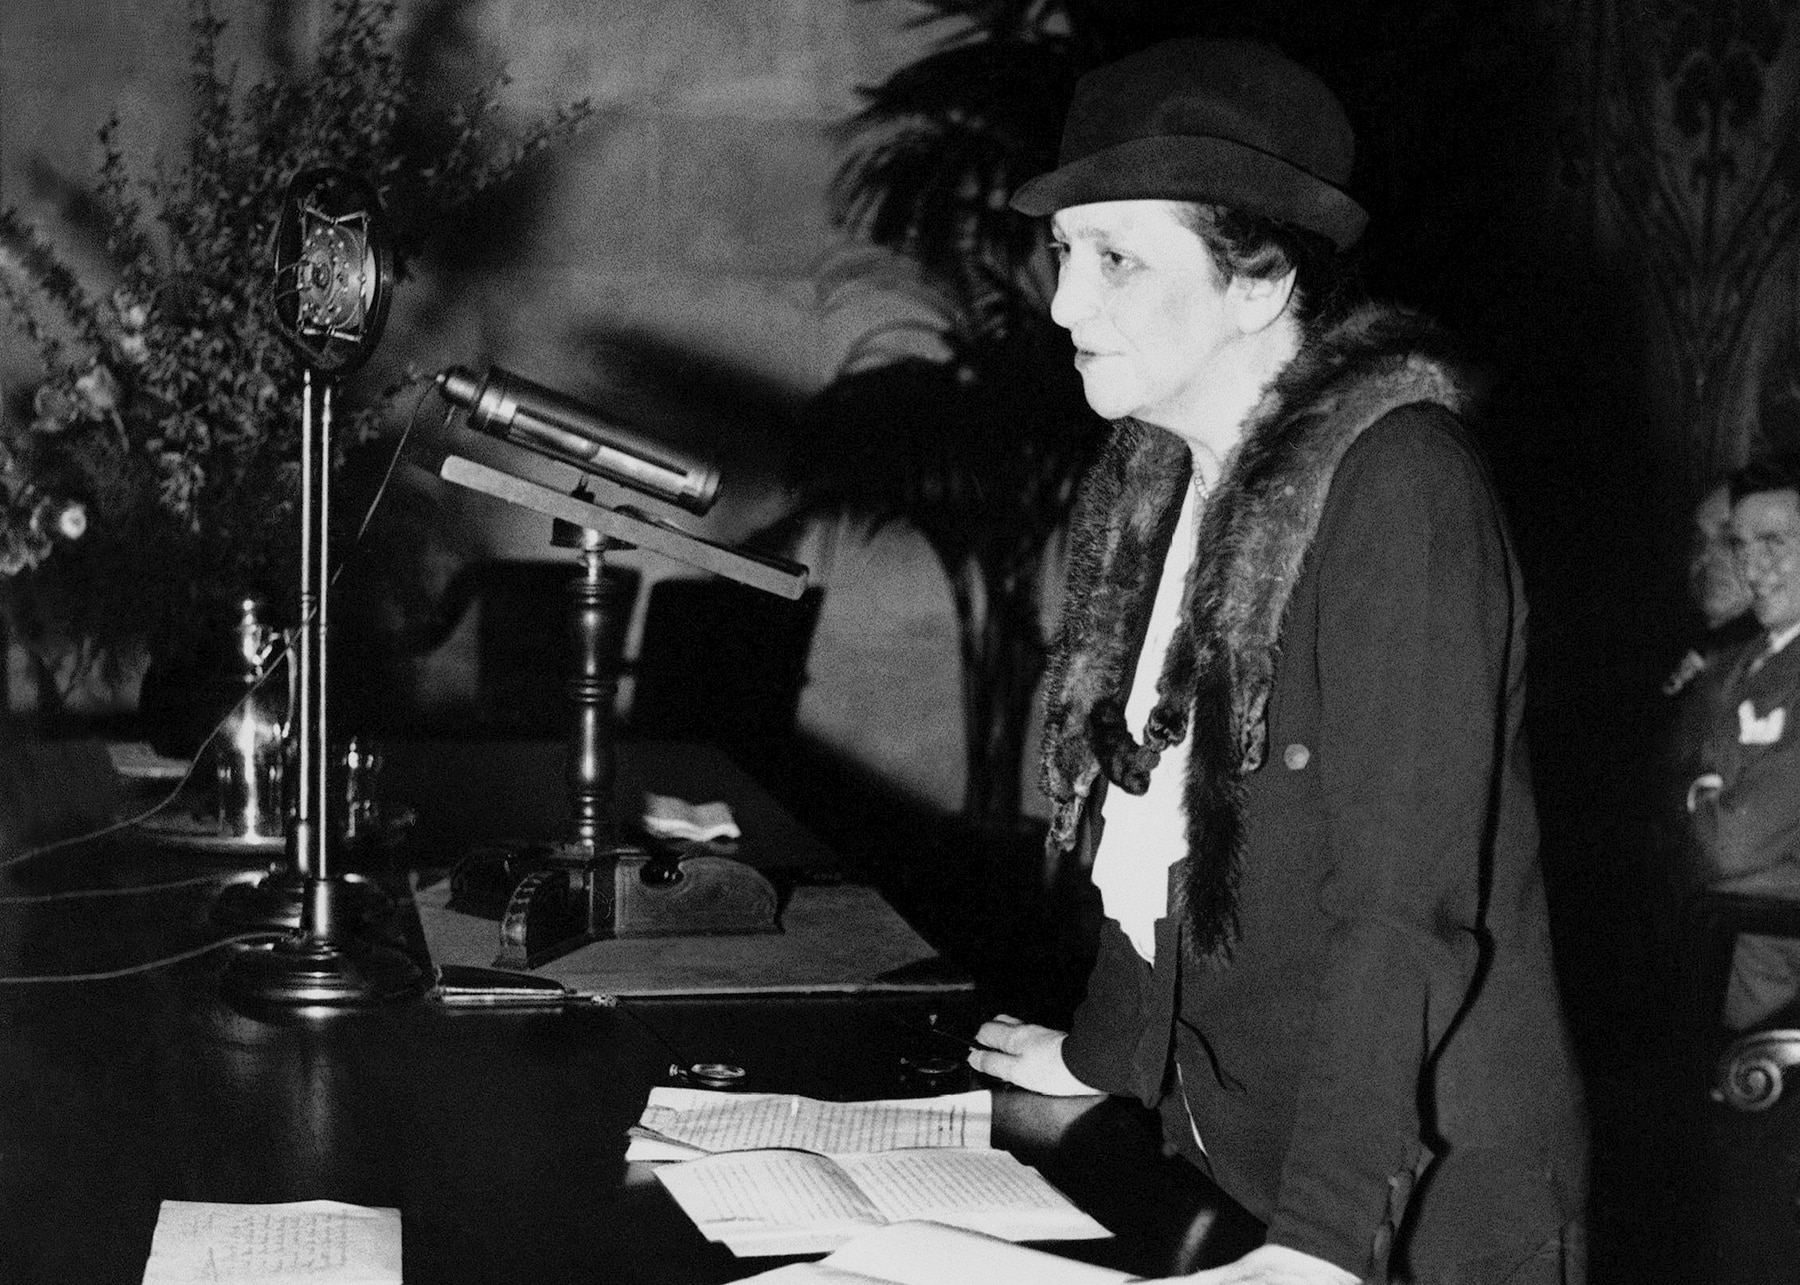 Frances Perkins de pé apoiada em mesa com microfones (© AP Images)